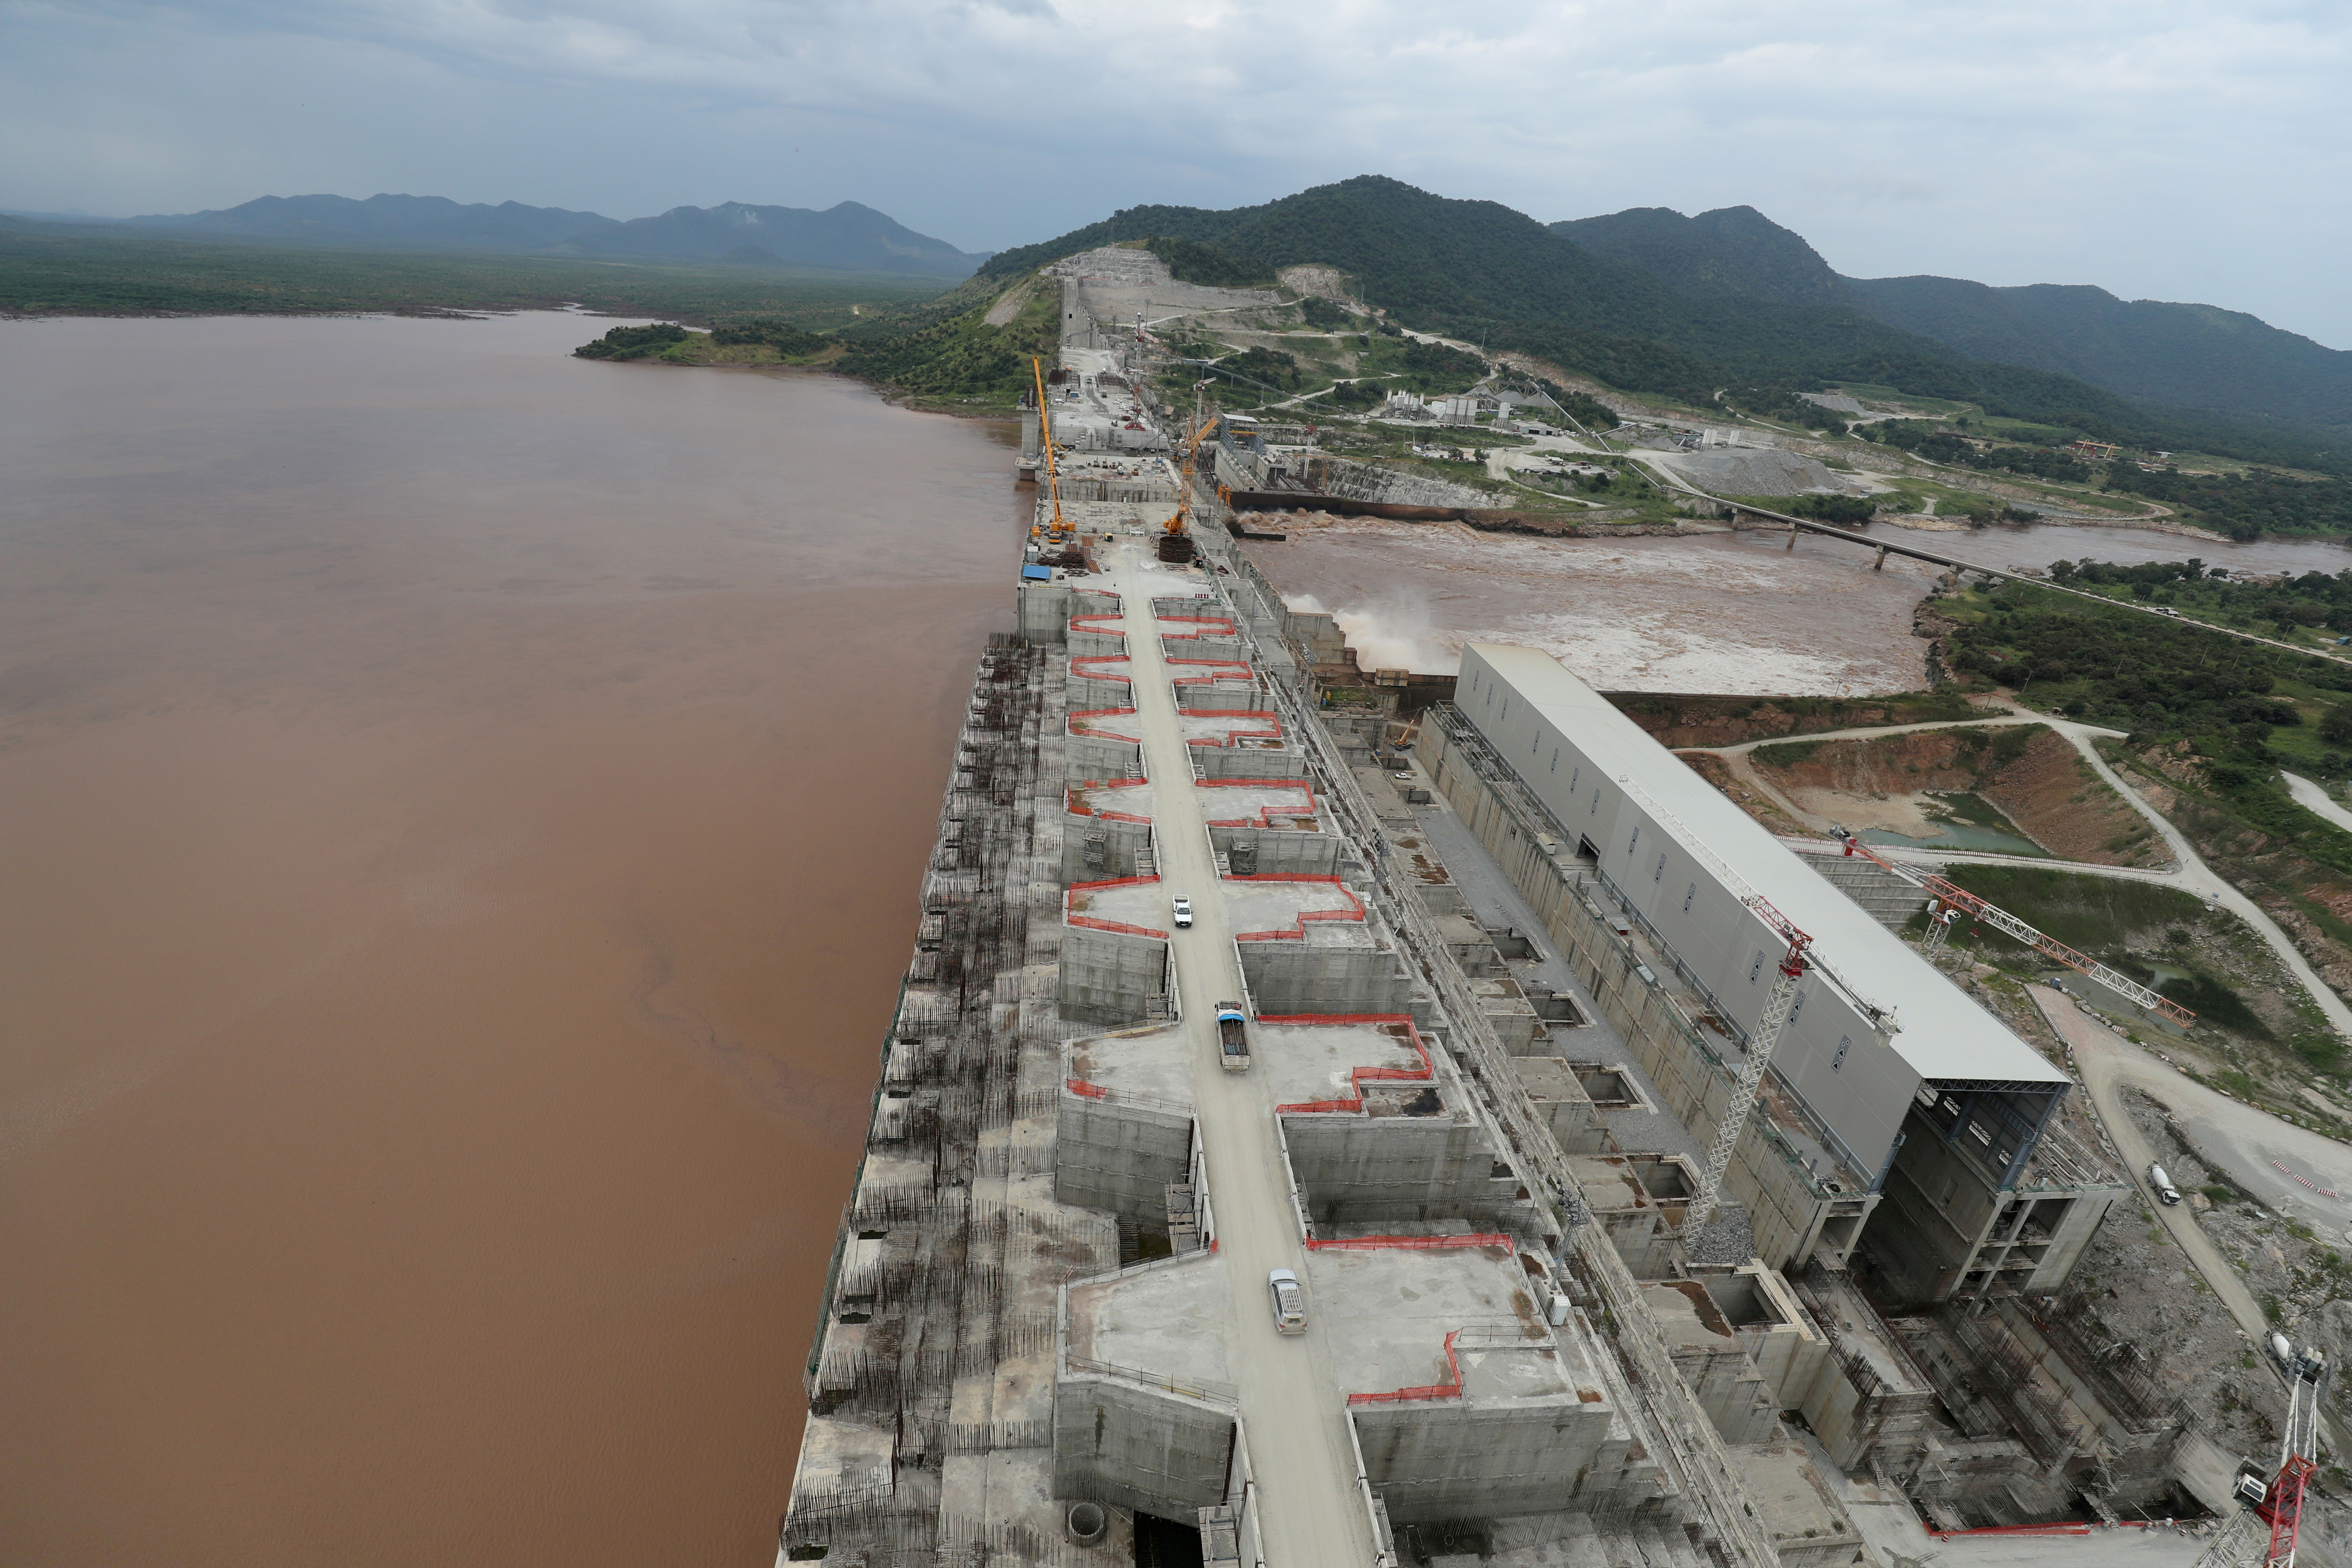 Ethiopia's Grand Renaissance Dam is seen as it undergoes construction work on the river Nile in Guba Woreda, Benishangul Gumuz Region, Ethiopia September 26, 2019. REUTERS/Tiksa Negeri